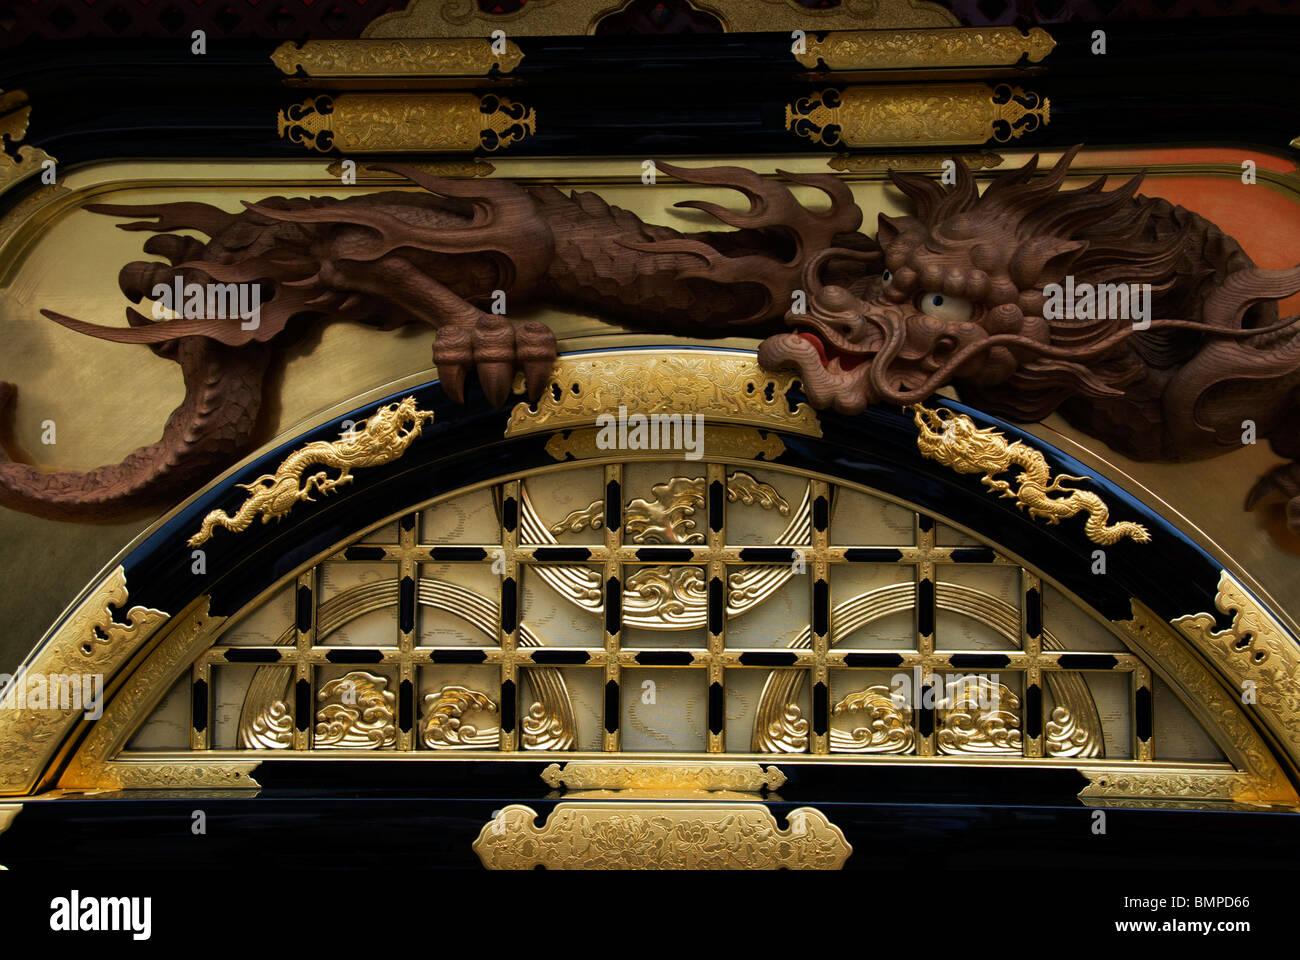 Detail der Yatai Schwimmer aus dem berühmten Sanno Matsuri Festival in Takayama, Japan Stockbild